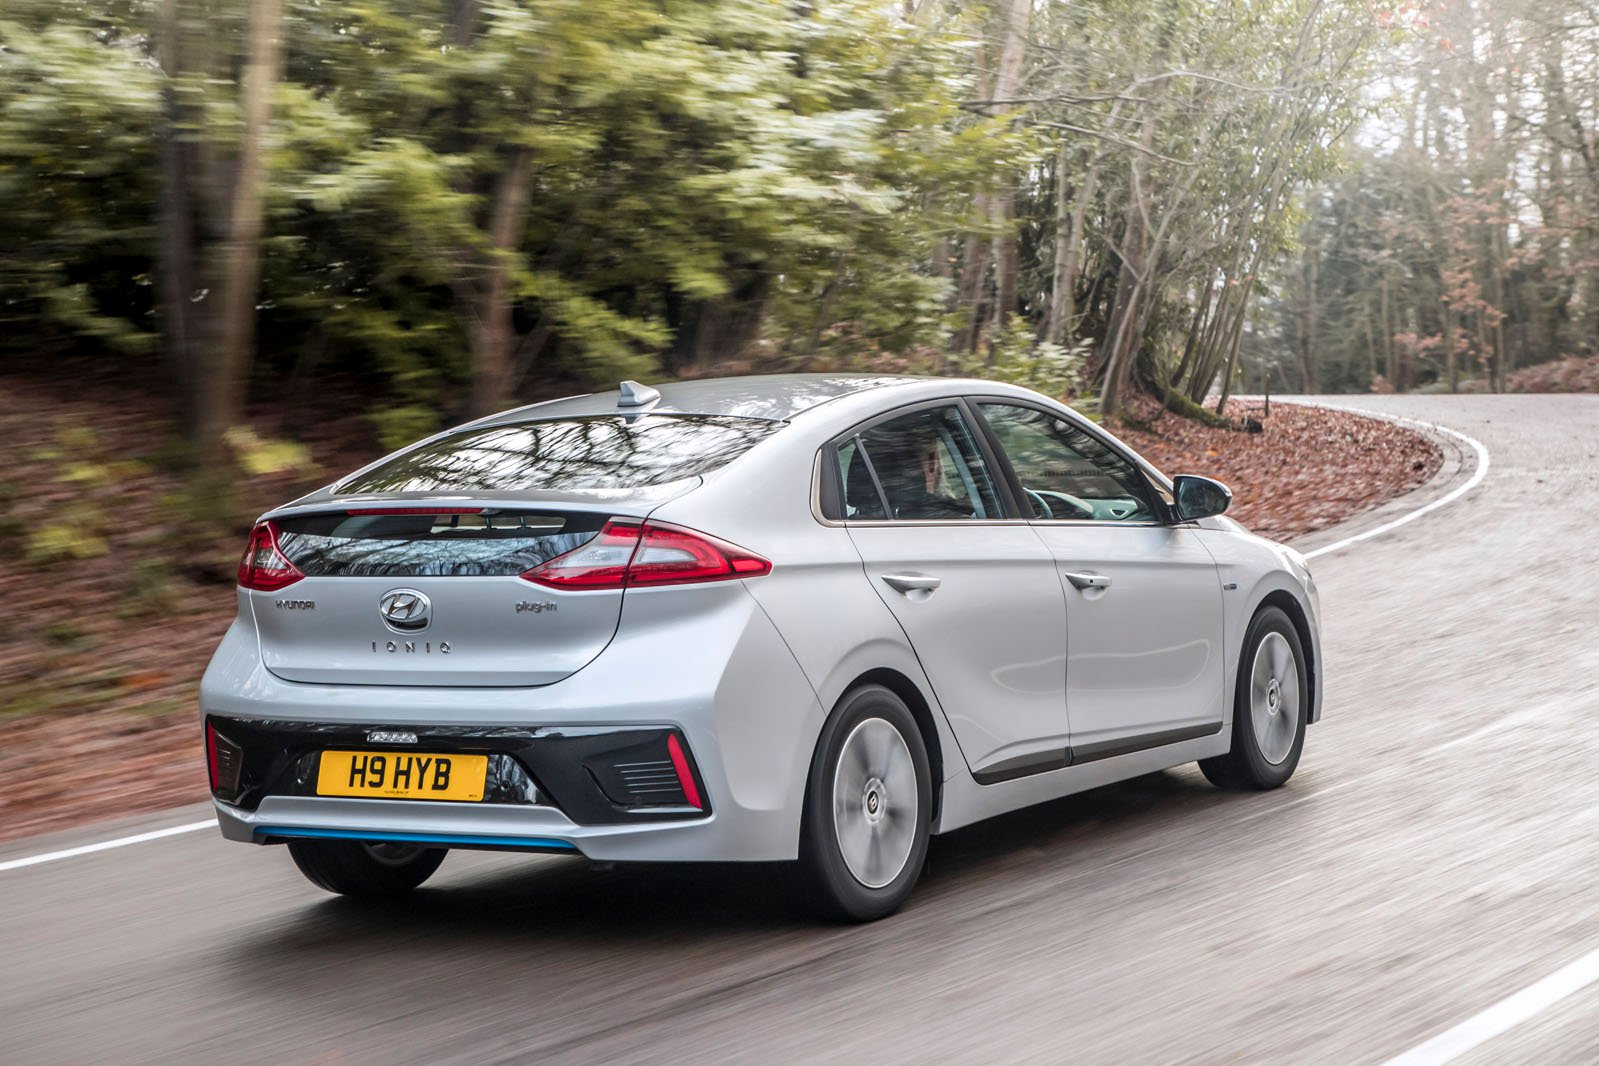 Hyundai Ioniq 2018 rear right tracking shot